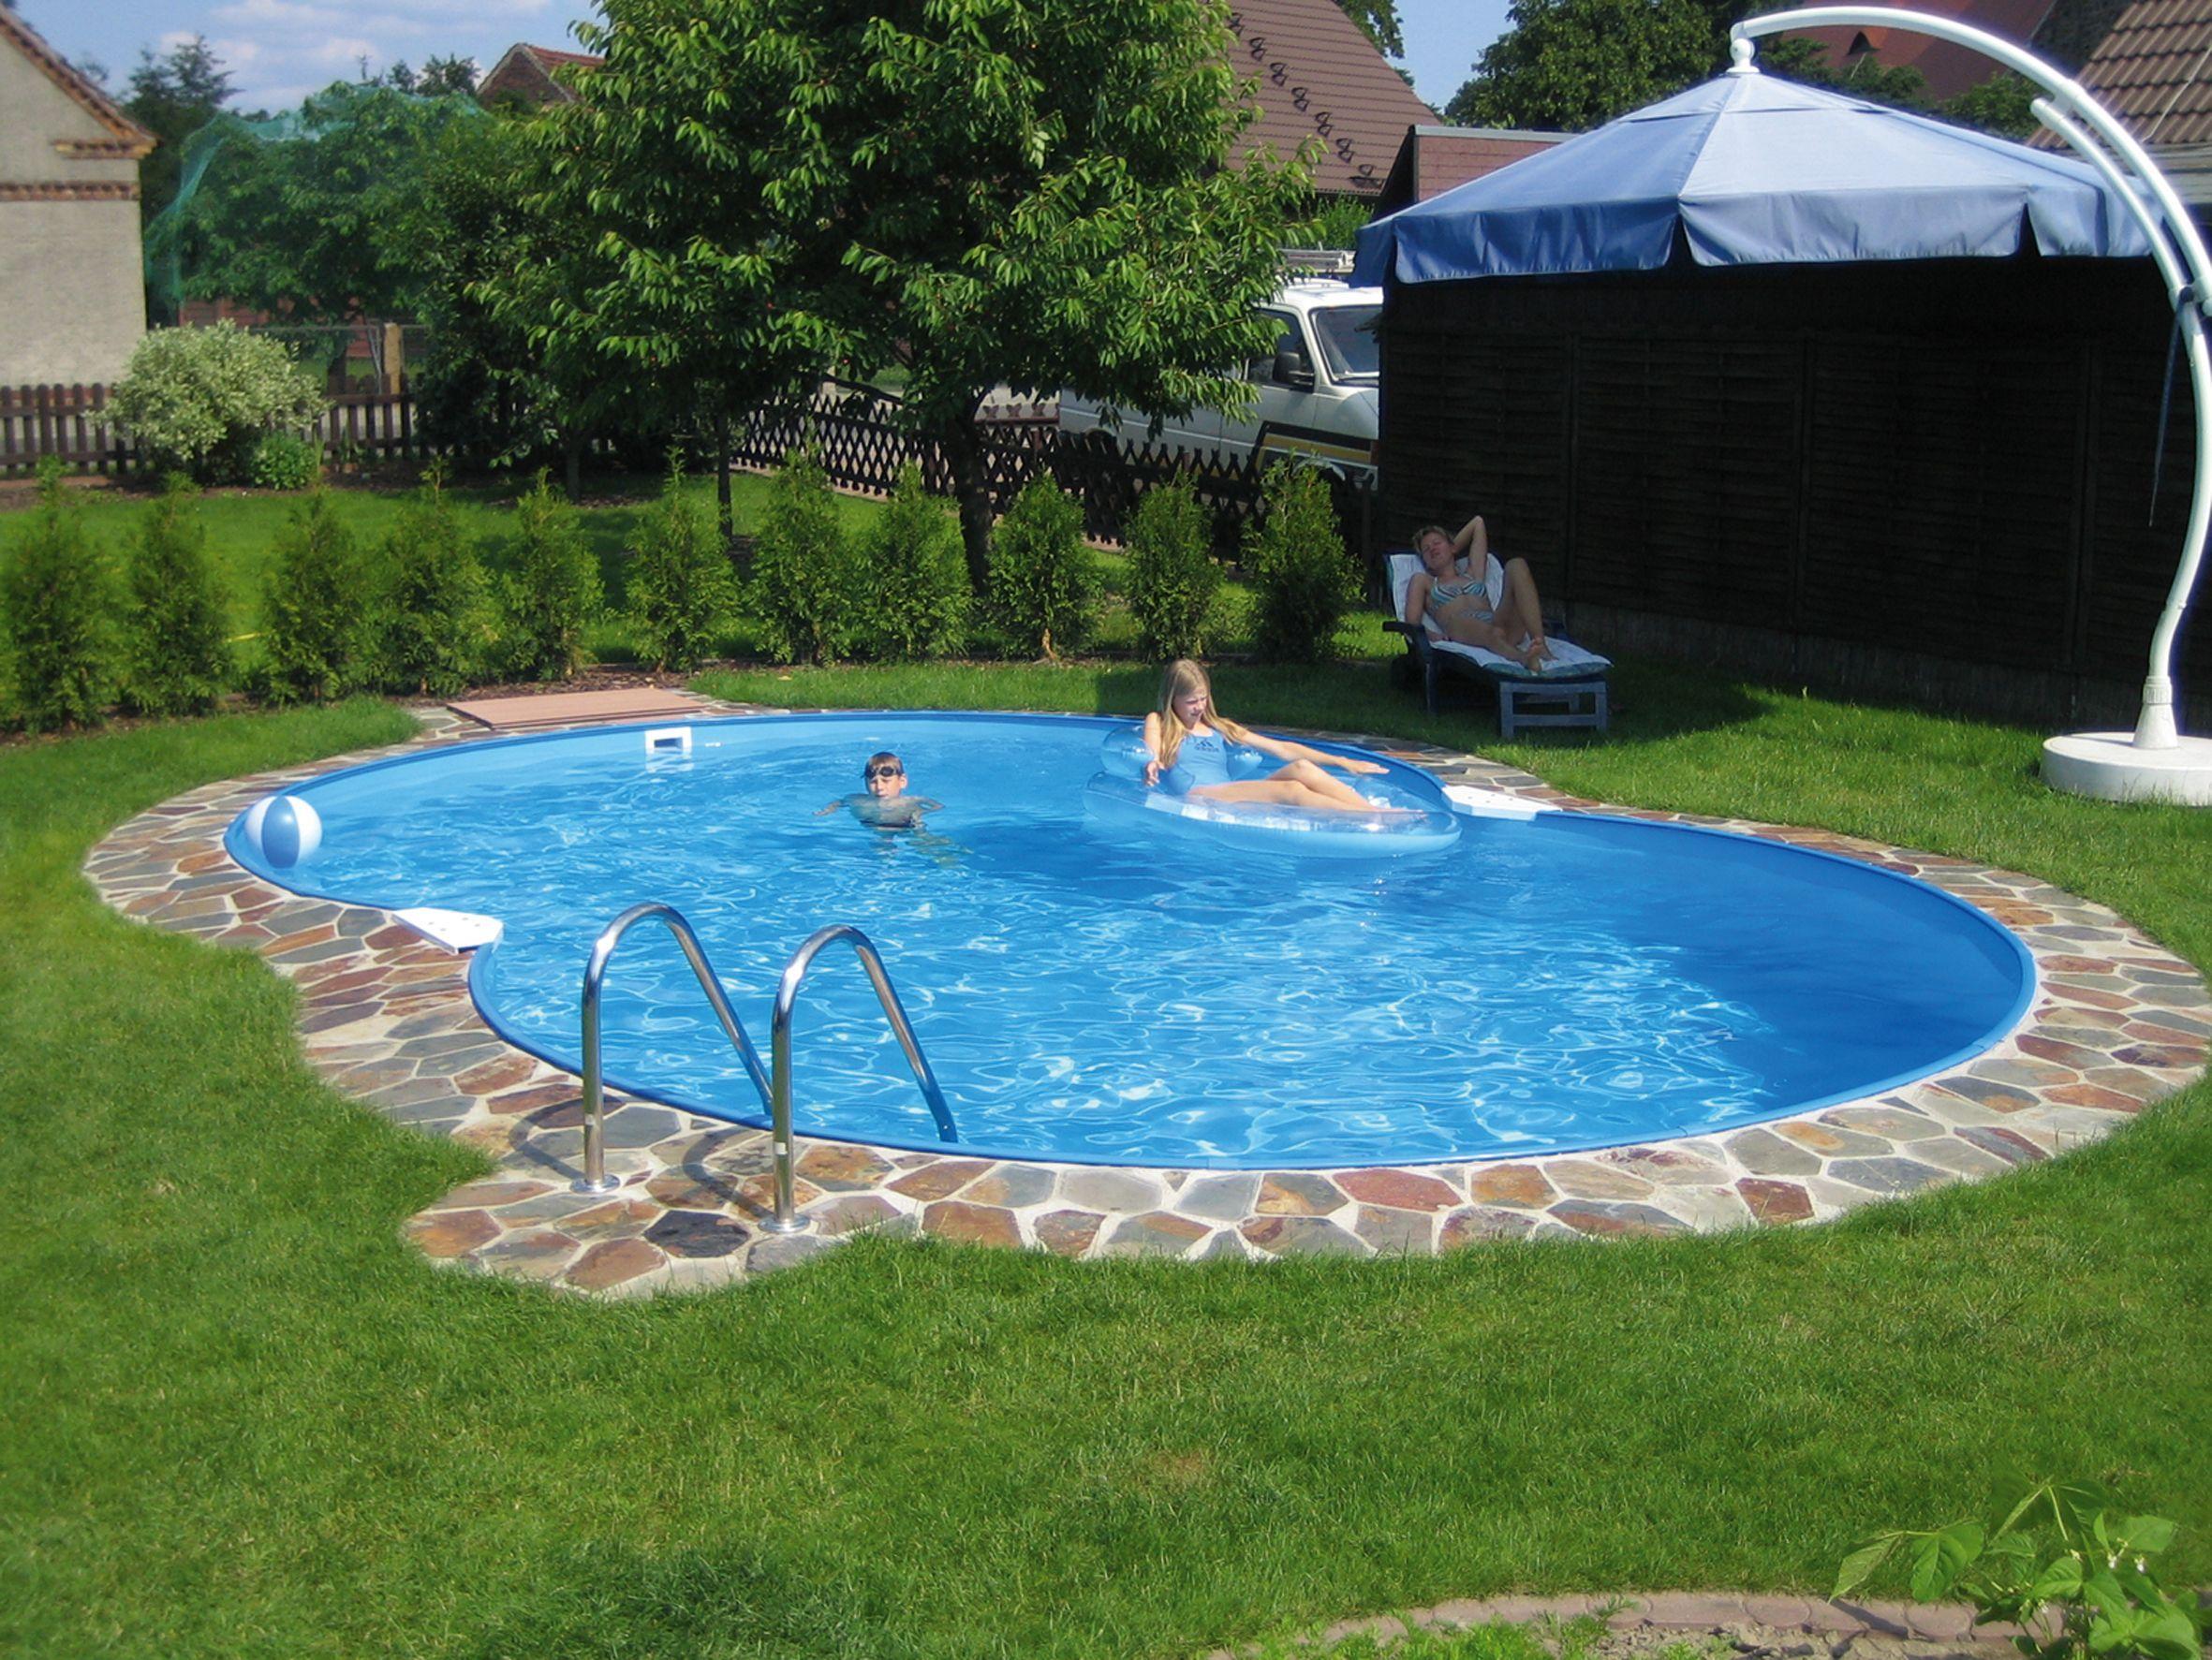 Backyard Landscaping Ideas Swimming Pool Design In 2020 Swimming Pools Backyard Small Backyard Pools Small Inground Pool